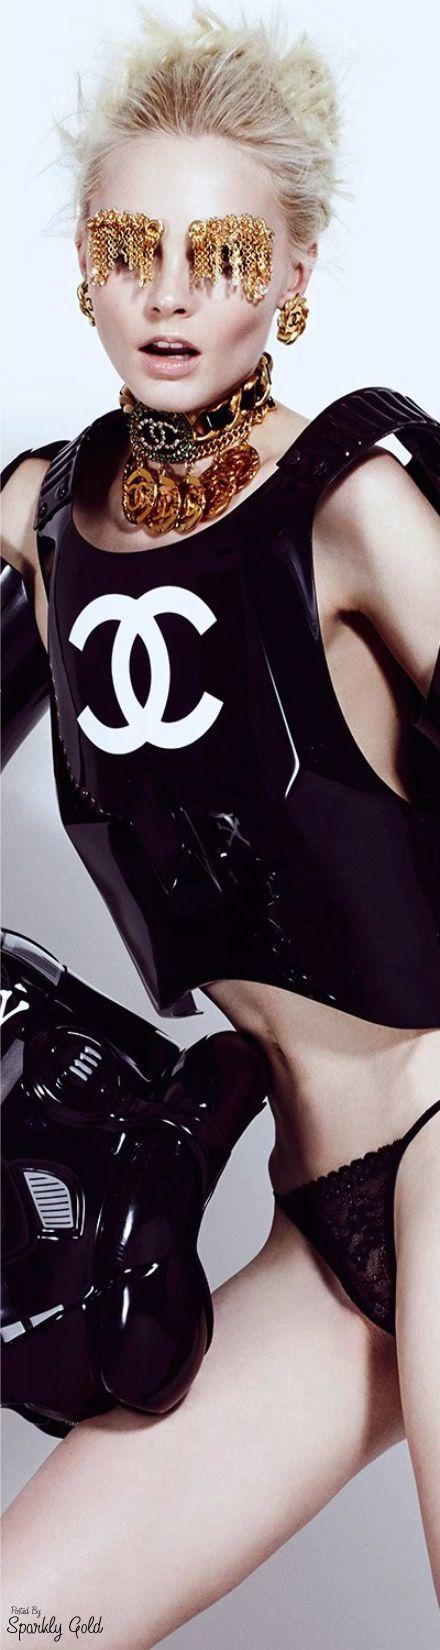 Chanel Glam                                                       …